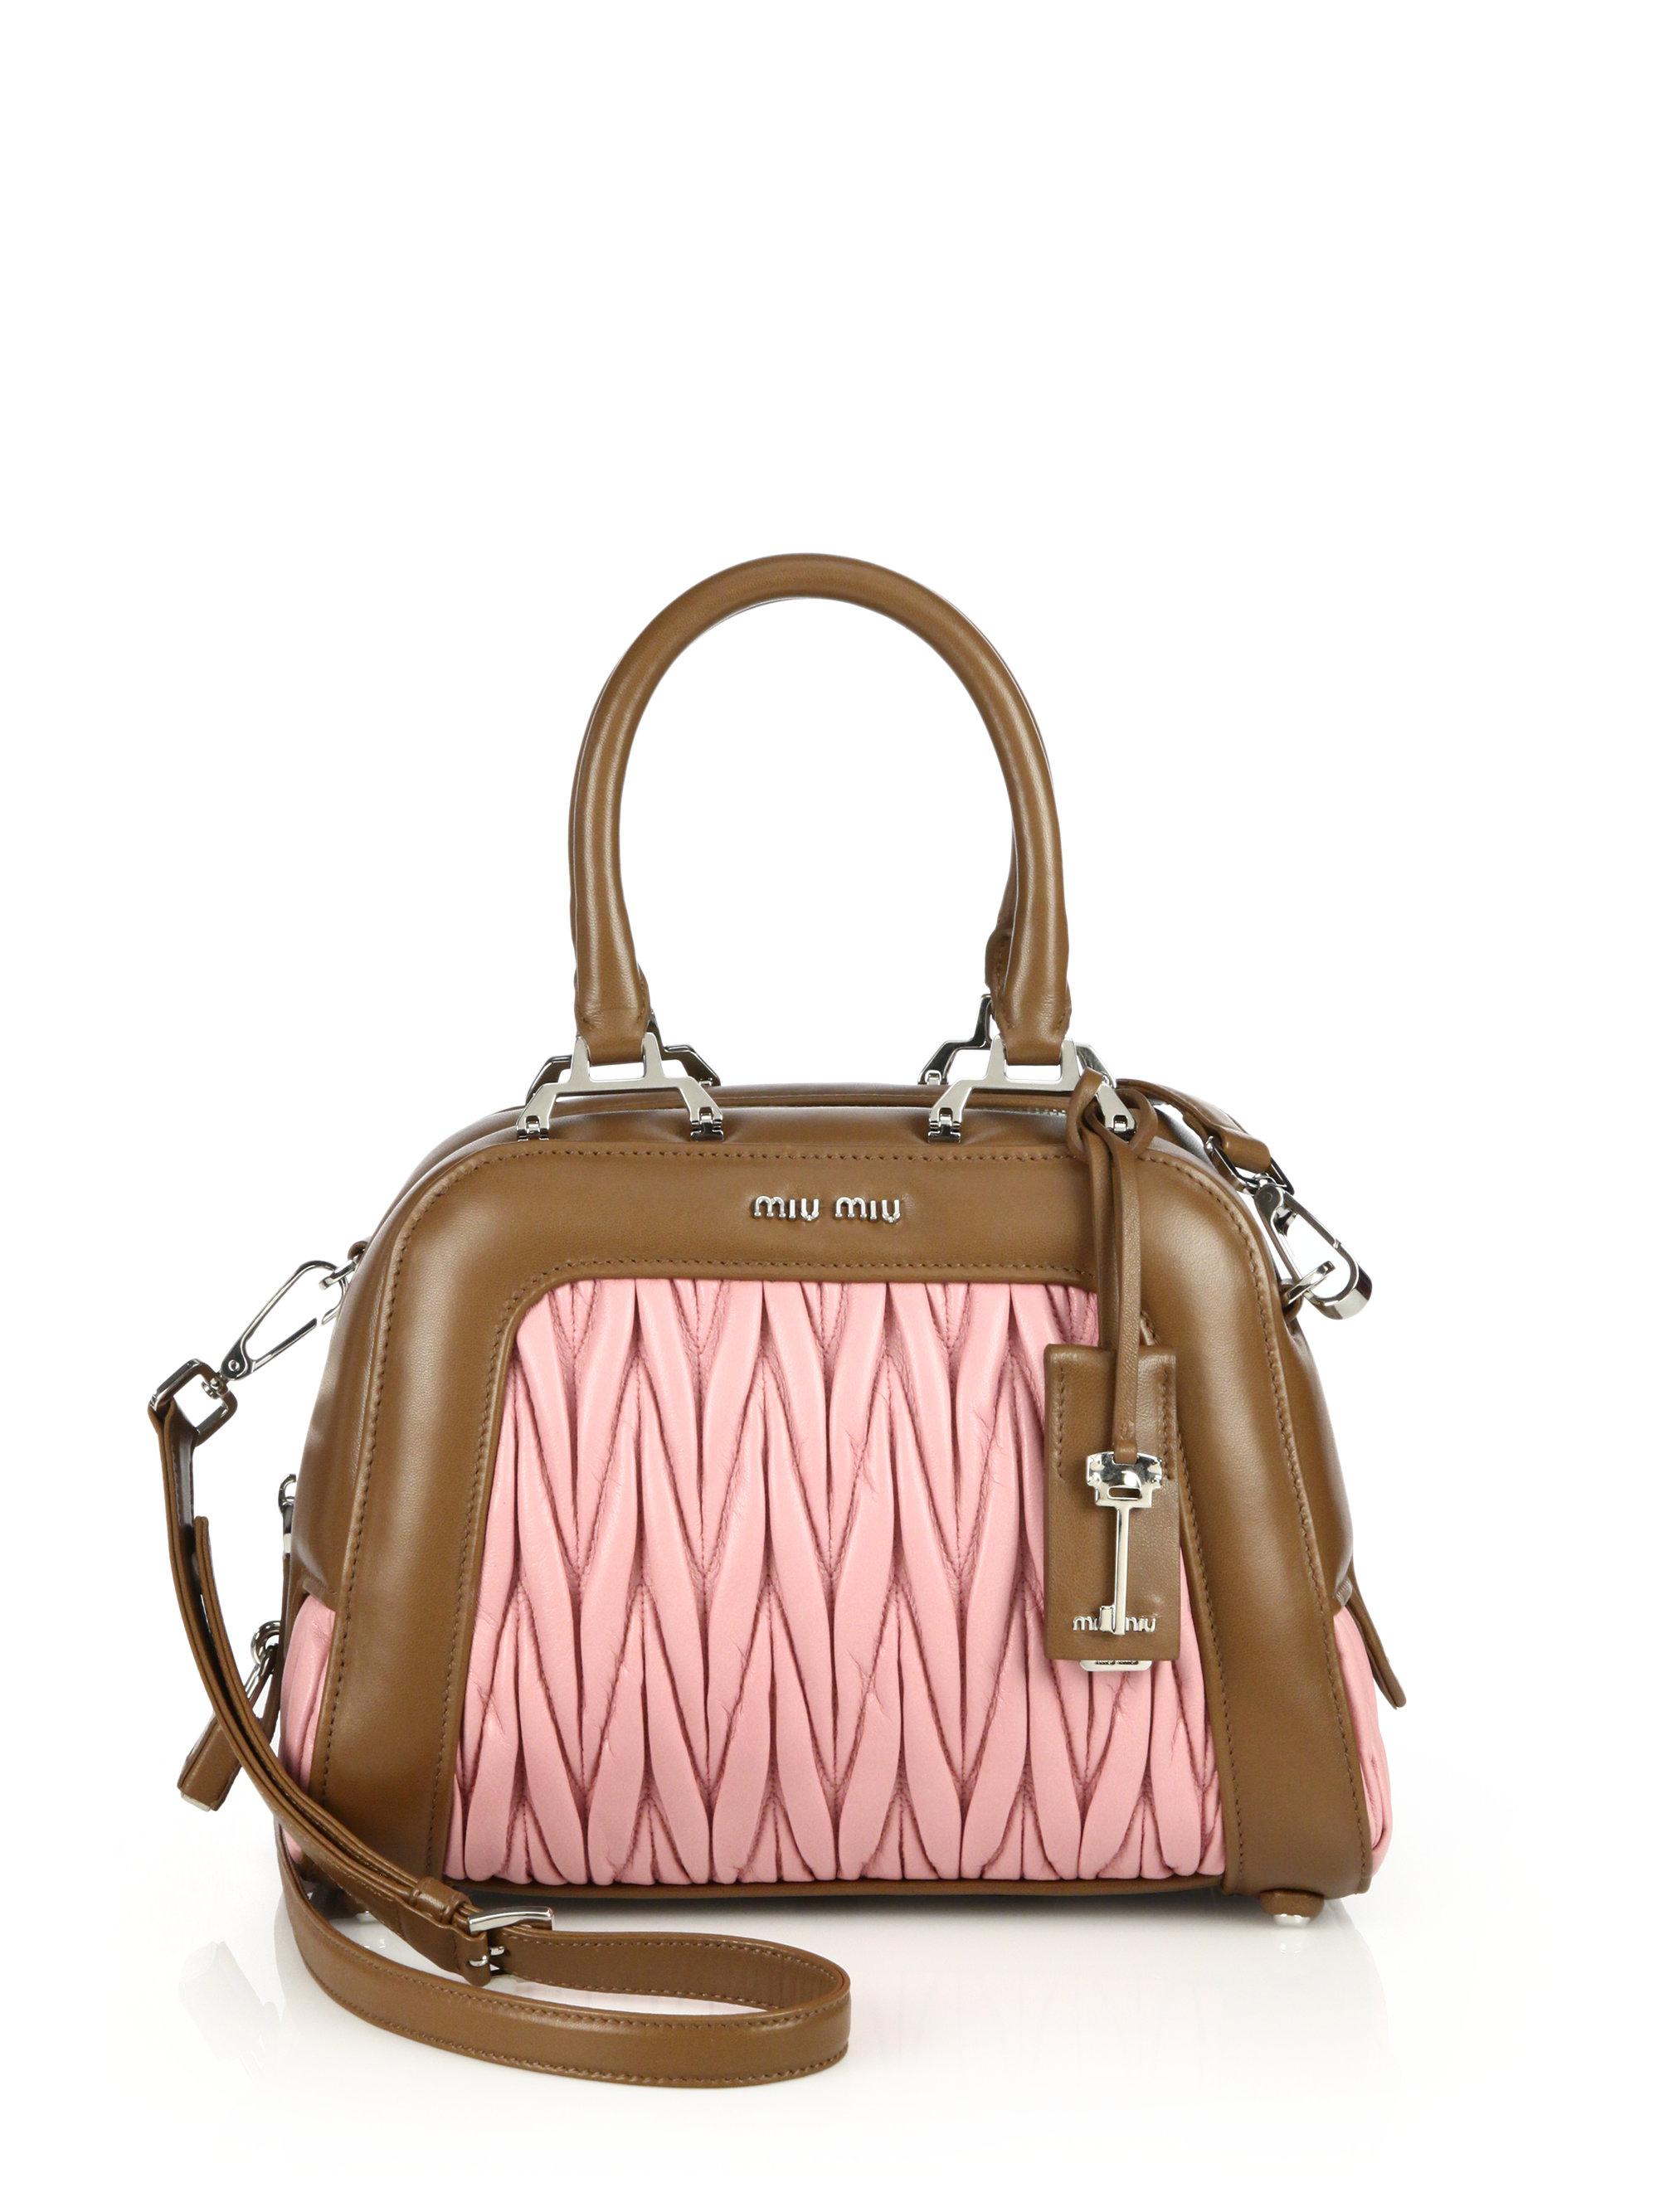 lyst miu miu matelasse bicolor satchel in pink. Black Bedroom Furniture Sets. Home Design Ideas